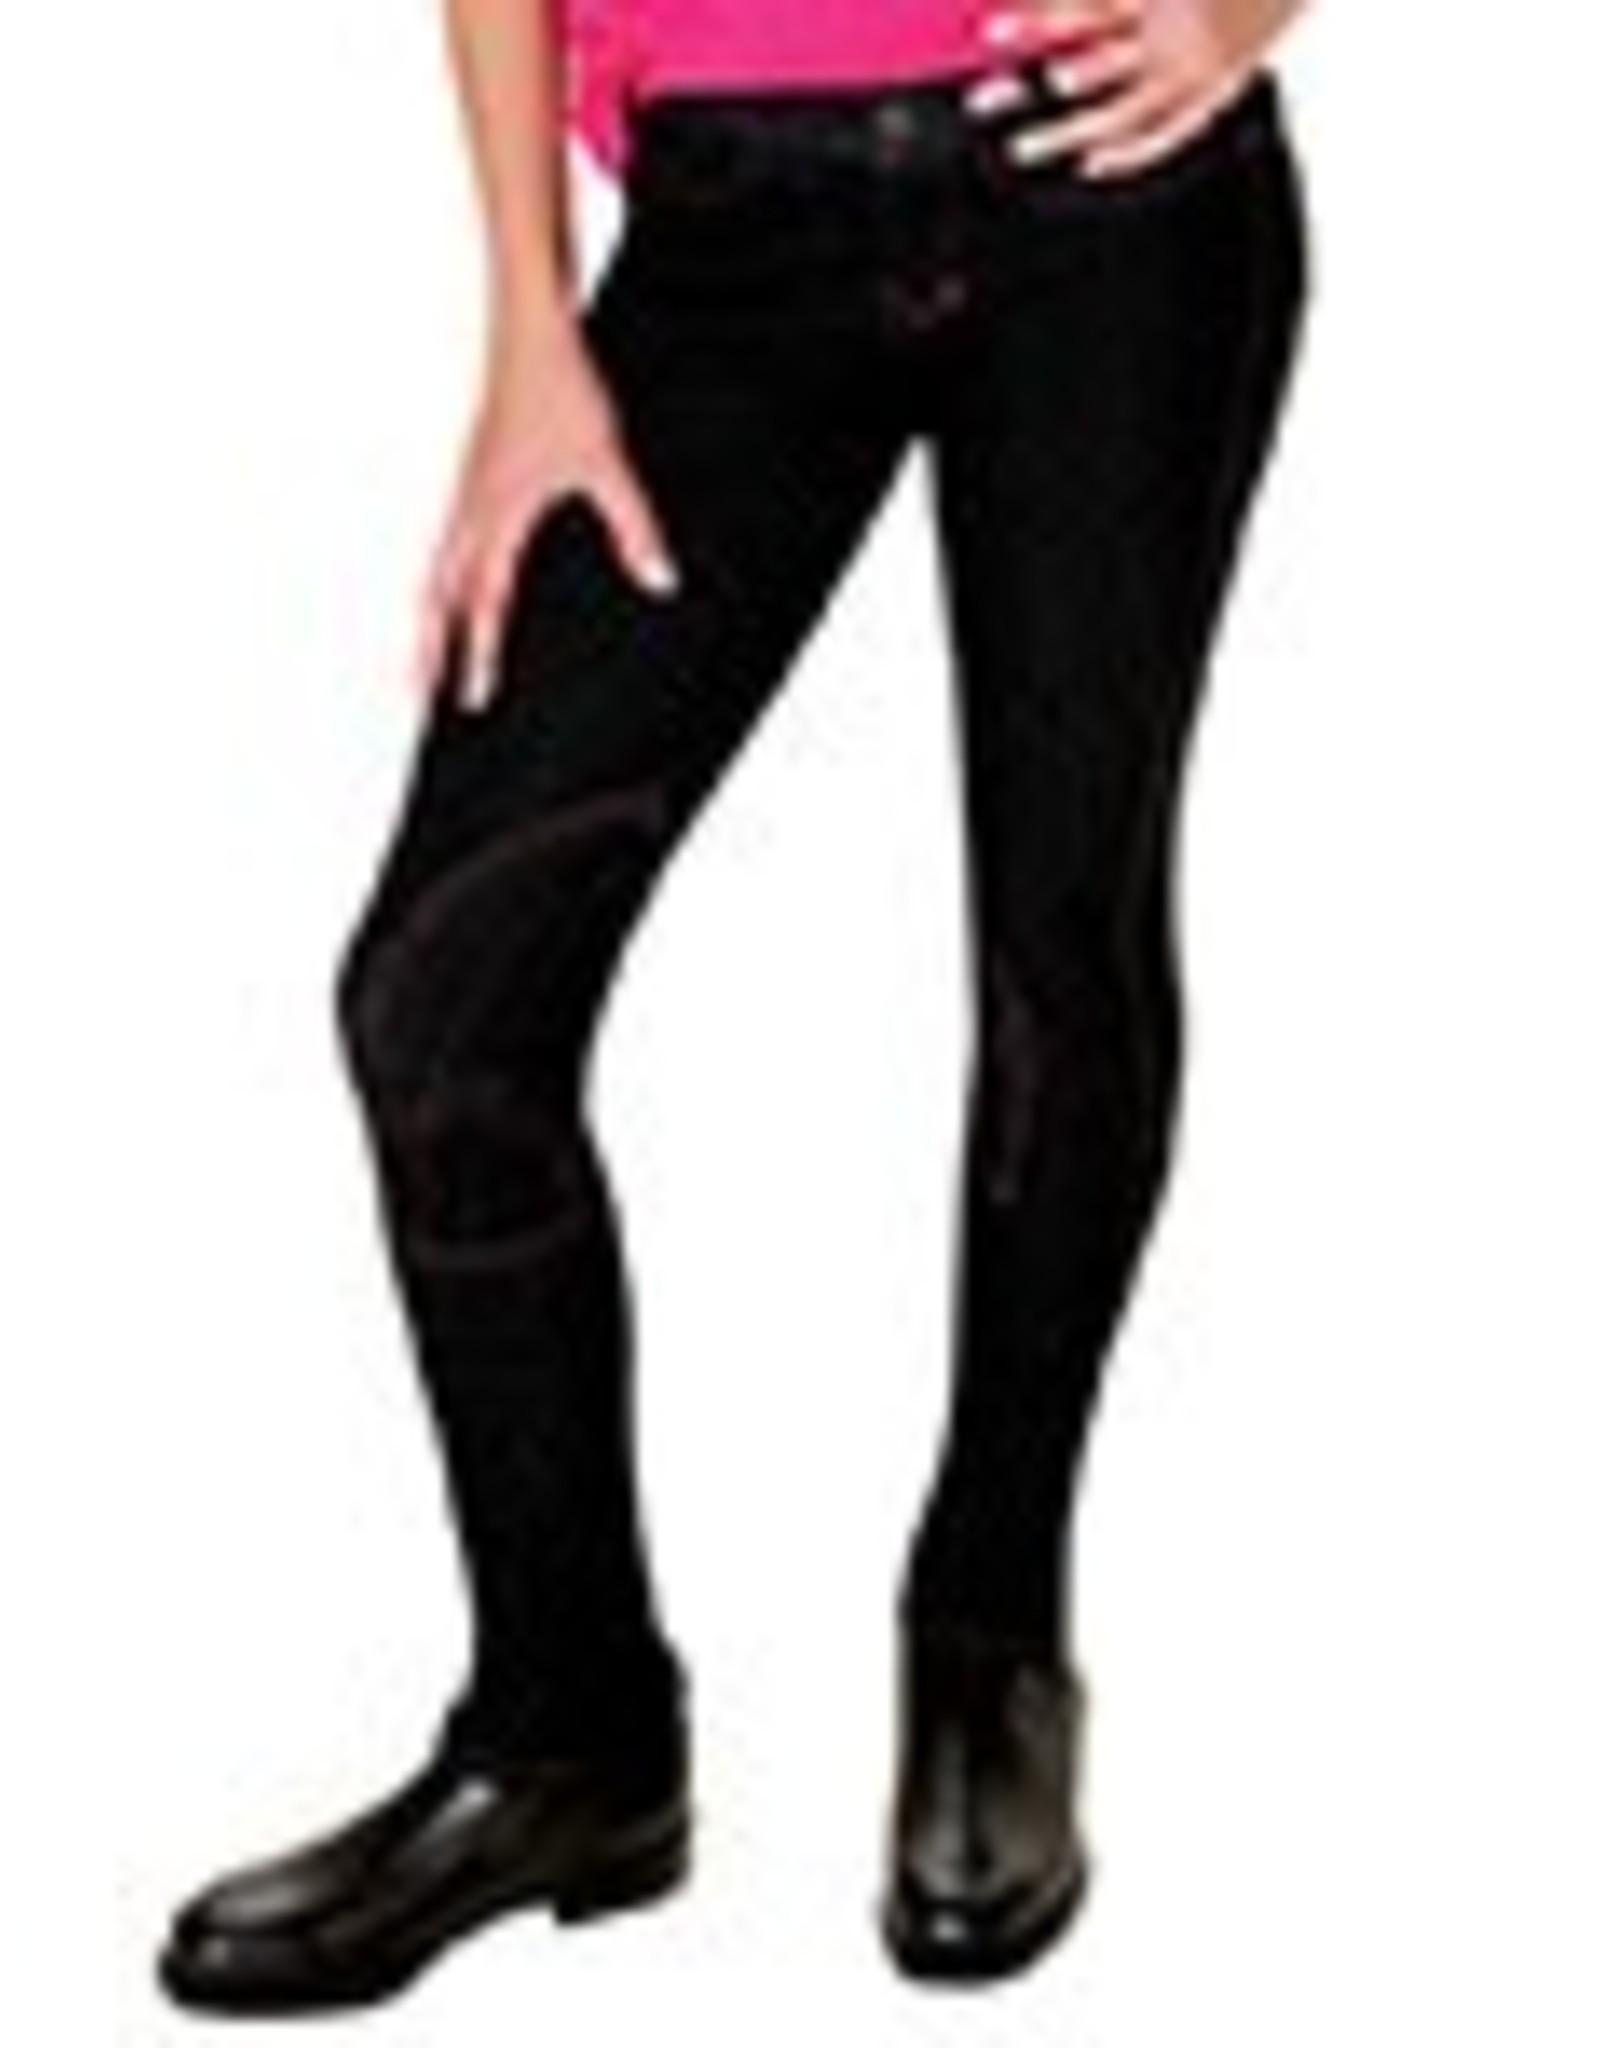 Lyndi J Hipster Jodhpur - Black Denim - Size 14